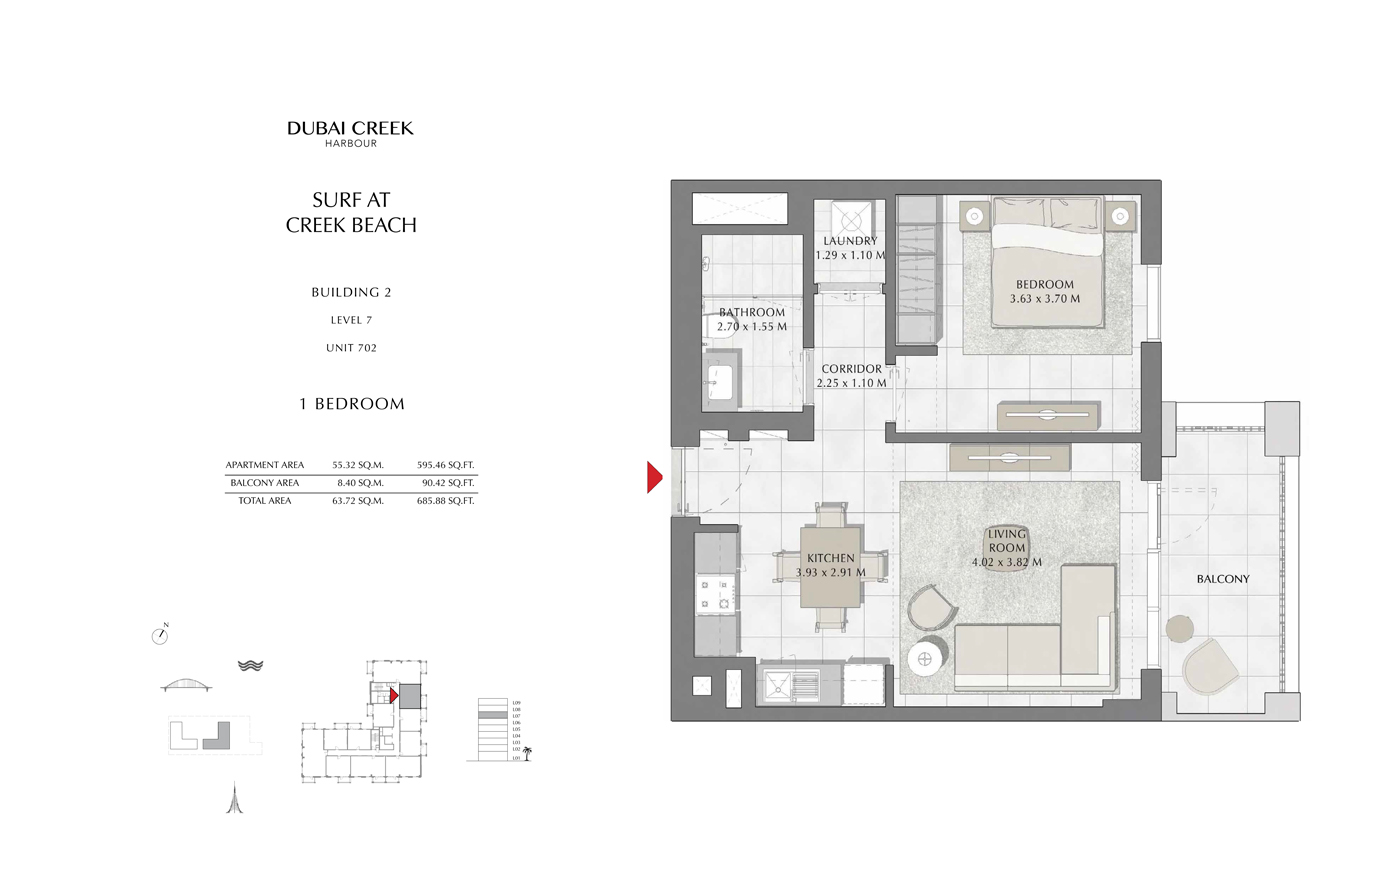 Building 2, 1 Bedroom Level 7, Size 685 Sq Ft